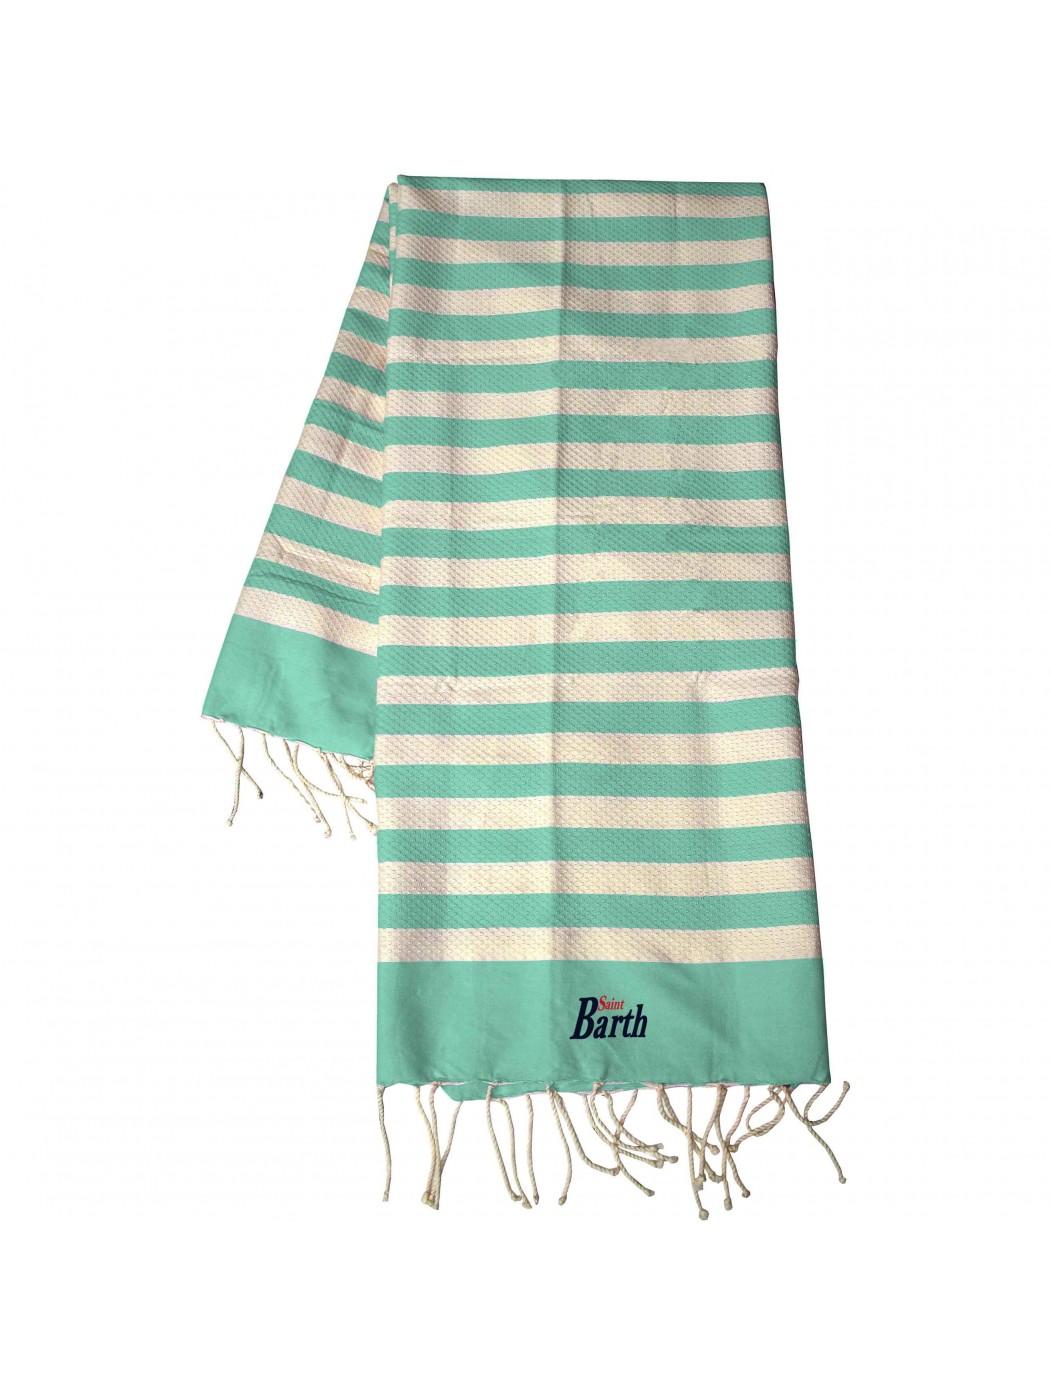 BEACH TOWEL FINGES FOUTAS SAINTBARTH MC2 FOUT001LIG 56